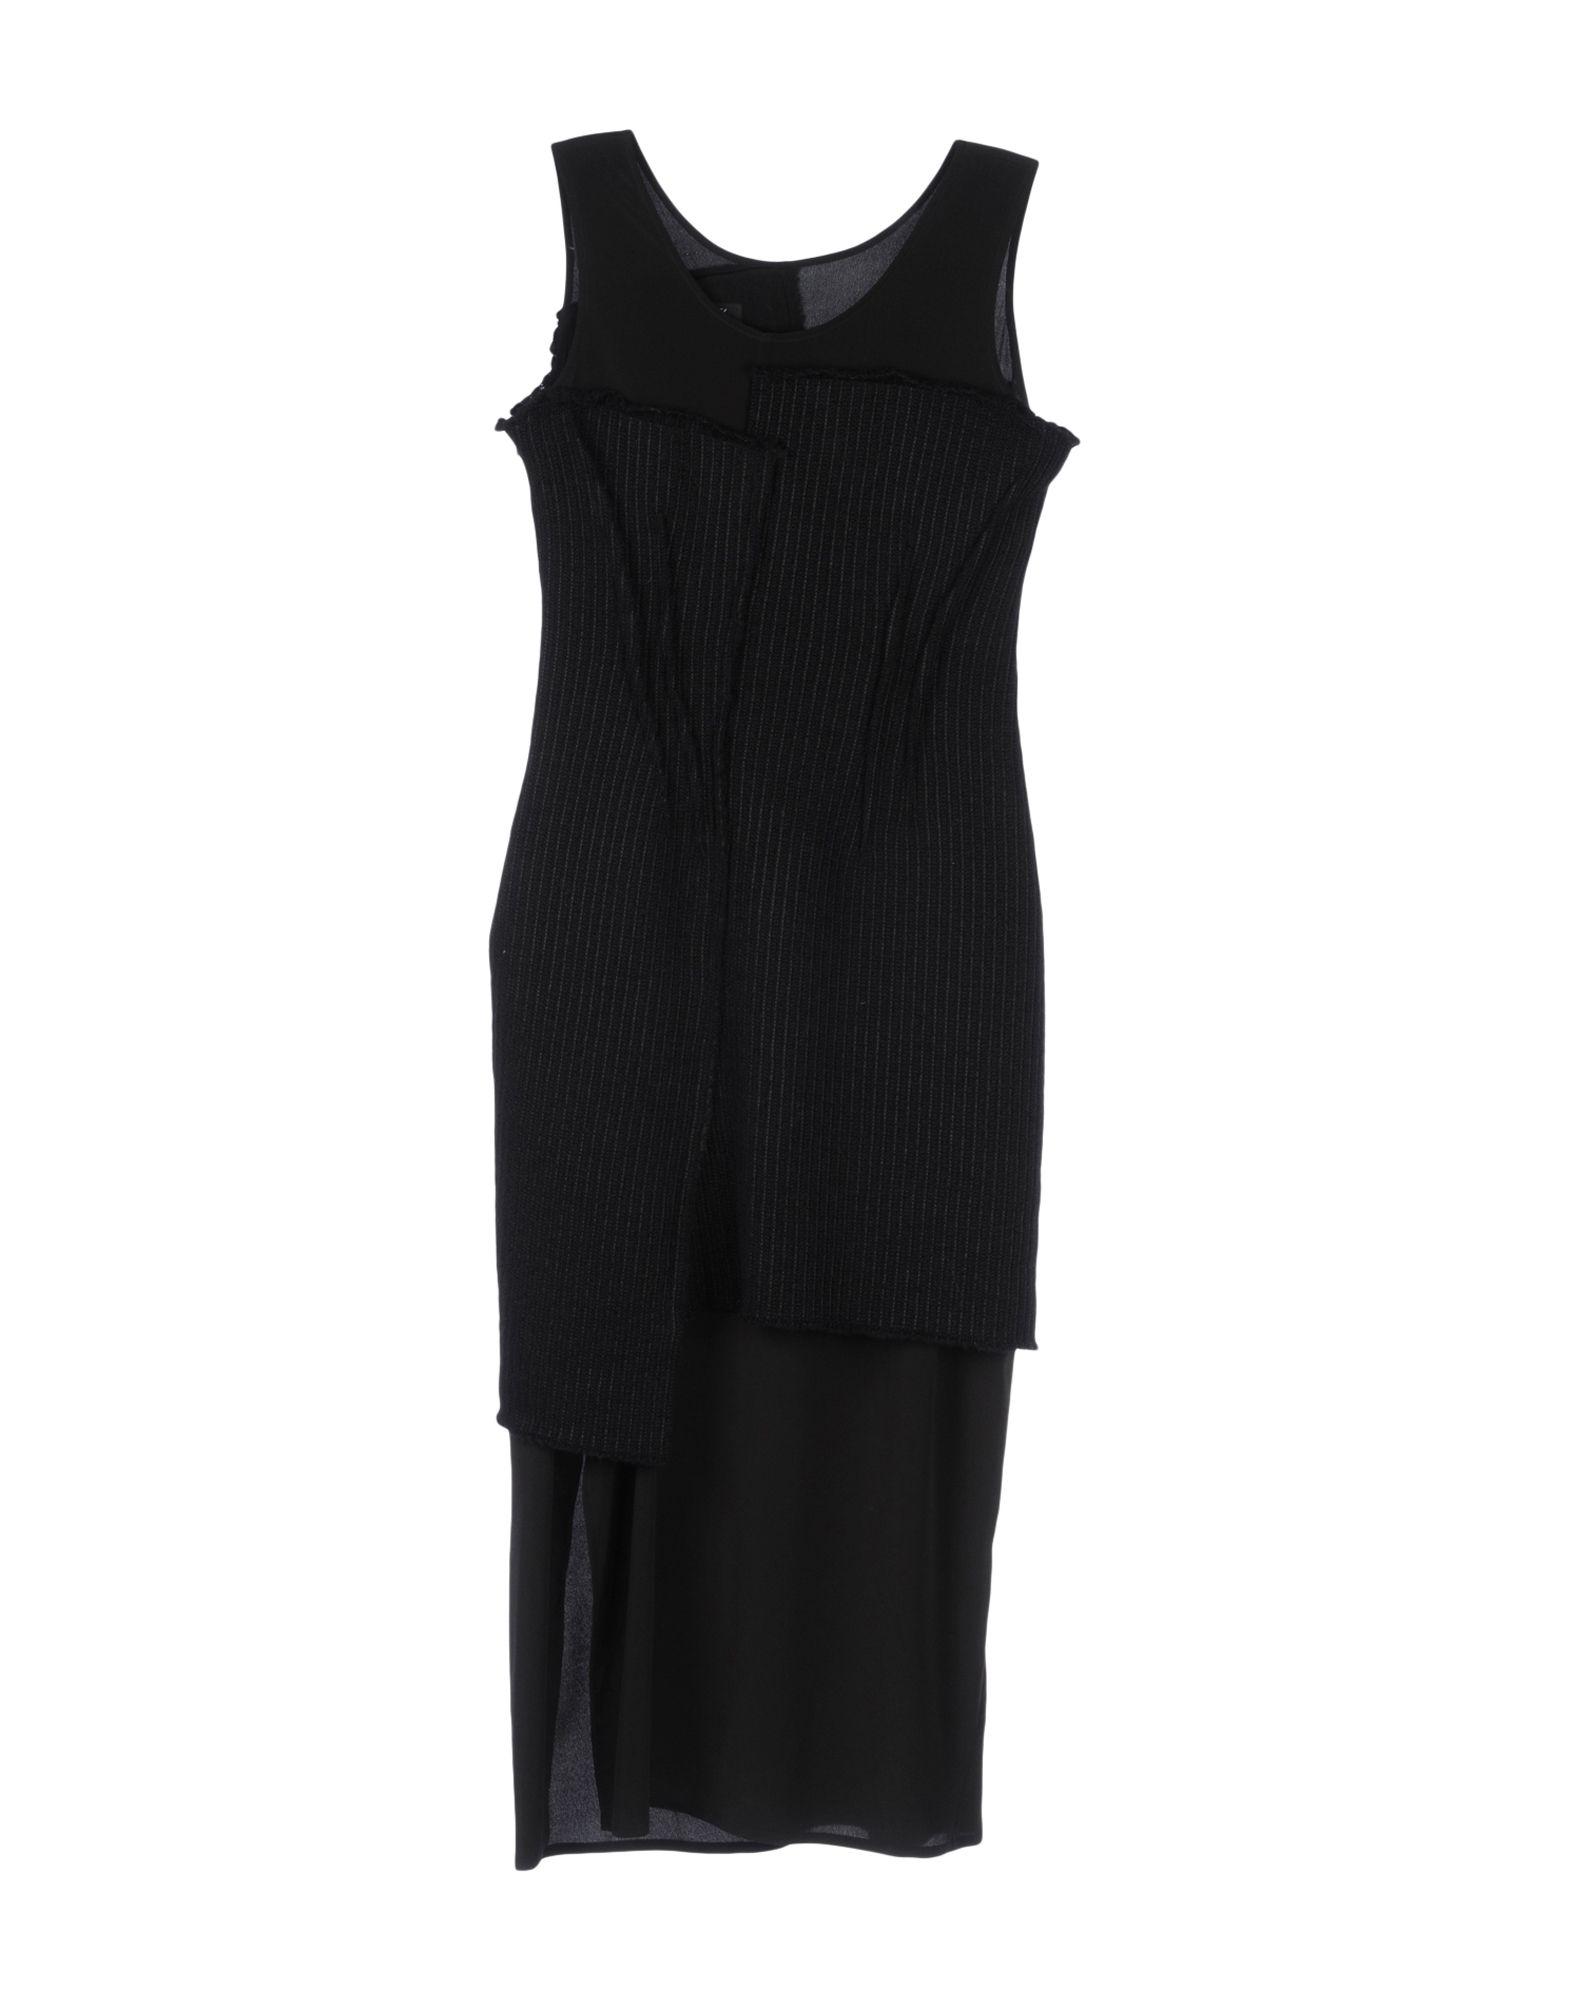 MICHIKO by Y'S Платье длиной 3/4 lisa corti платье длиной 3 4